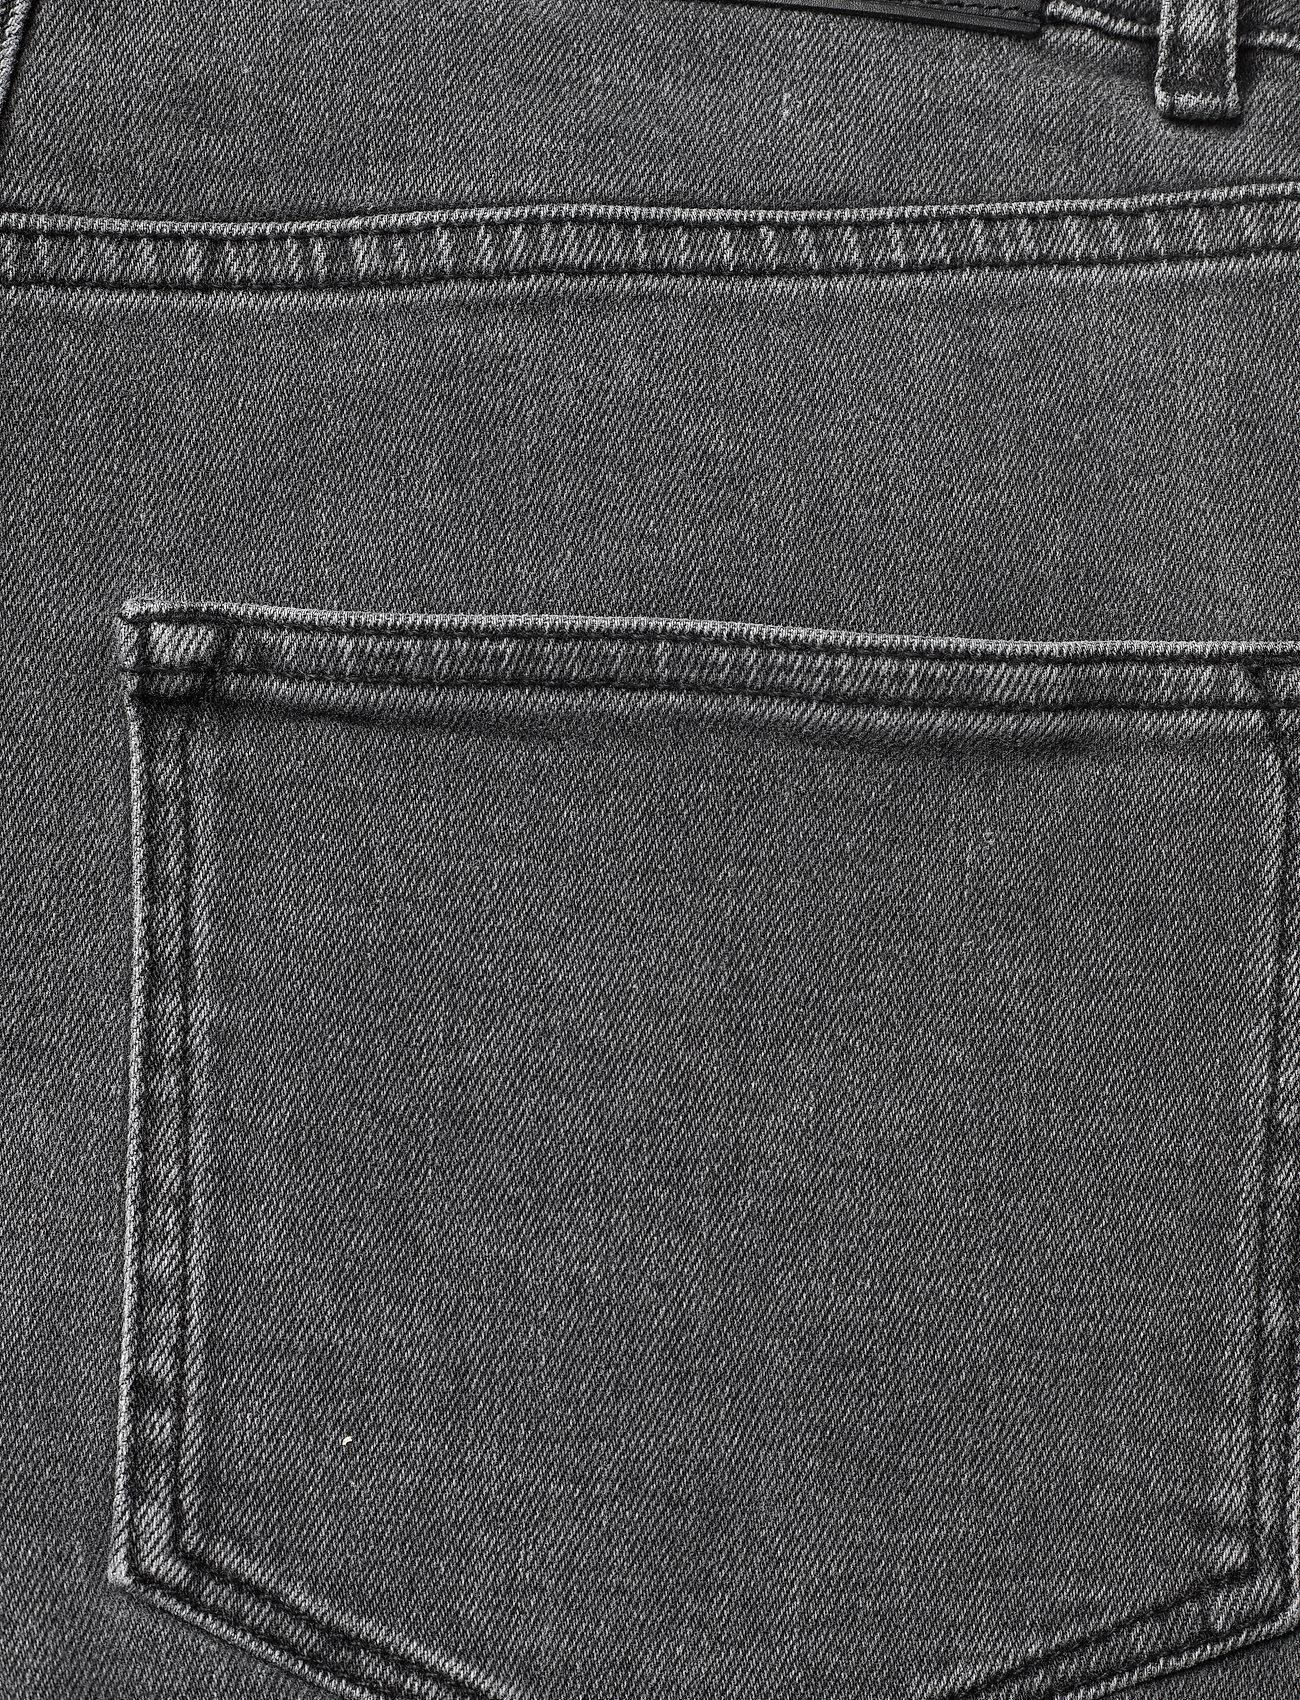 2NDDAY - 2ND Goa Thinktwice - jeansshorts - un black denim - 7